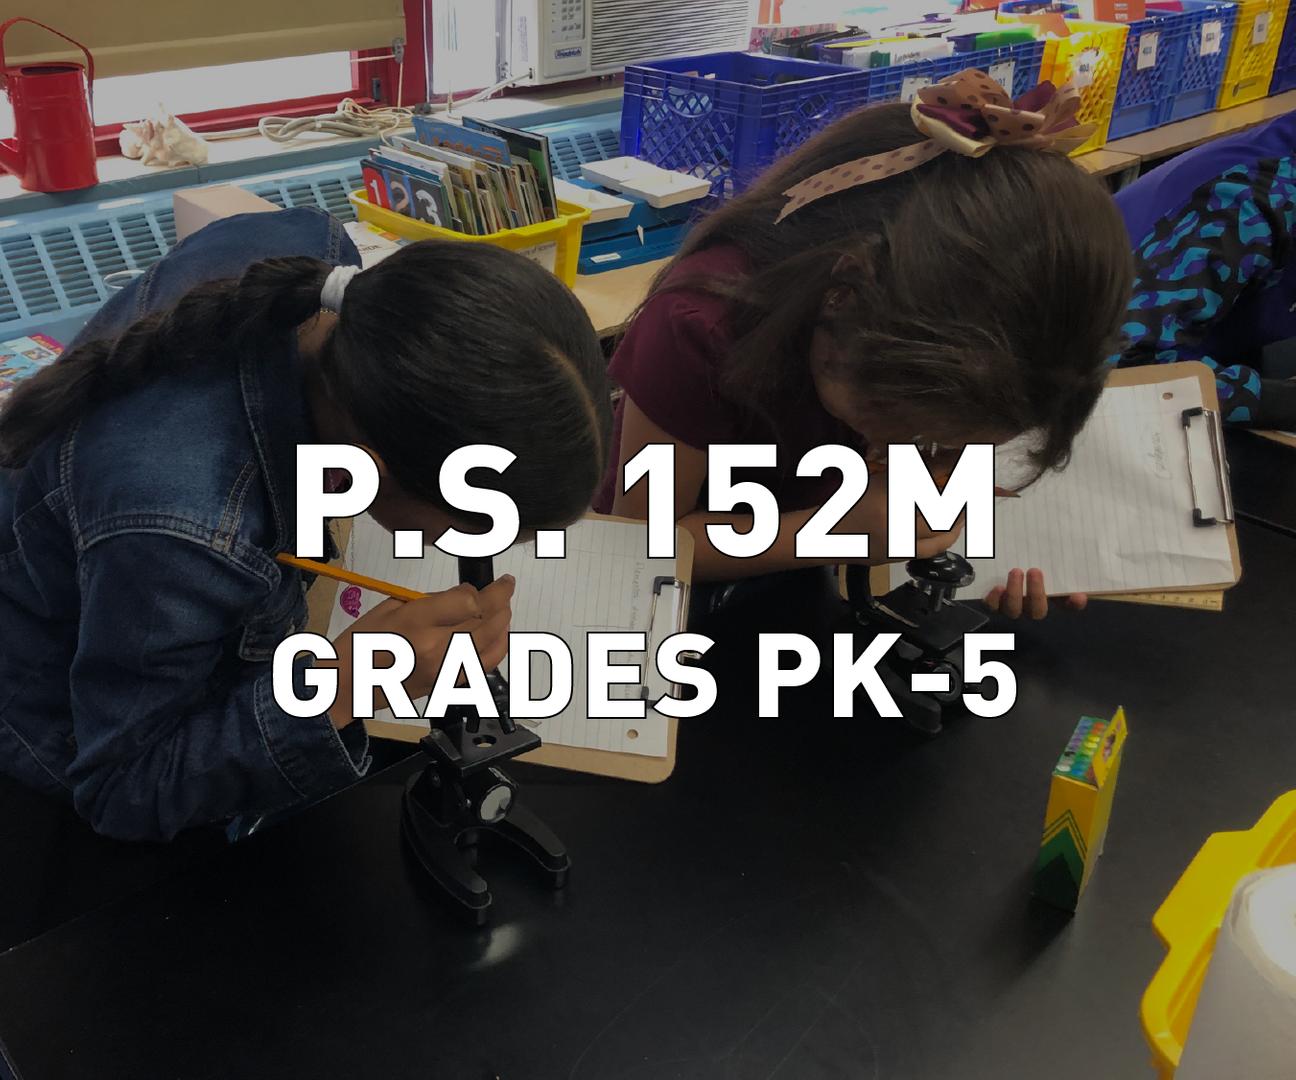 P.S. 152M Grades PK-5